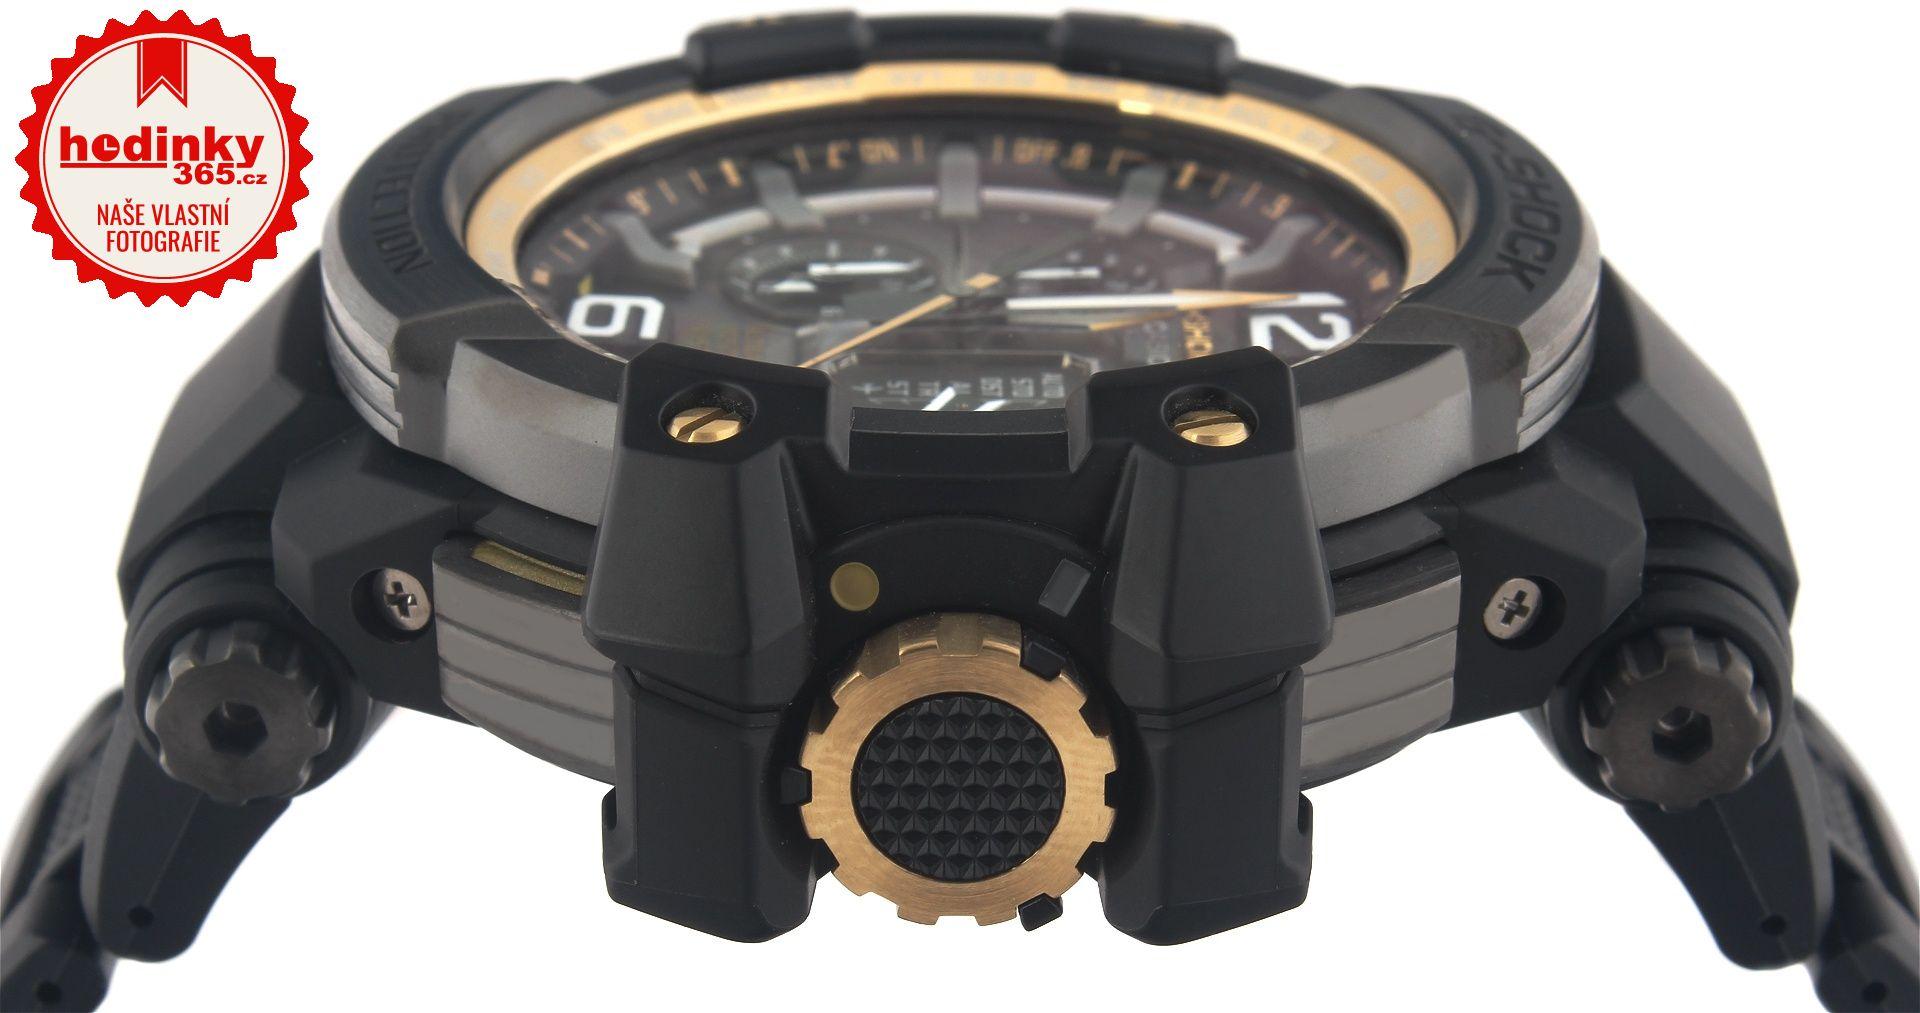 Casio G-Shock Gravitymaster GPW-1000FC-1A9ER  98bbd1a449